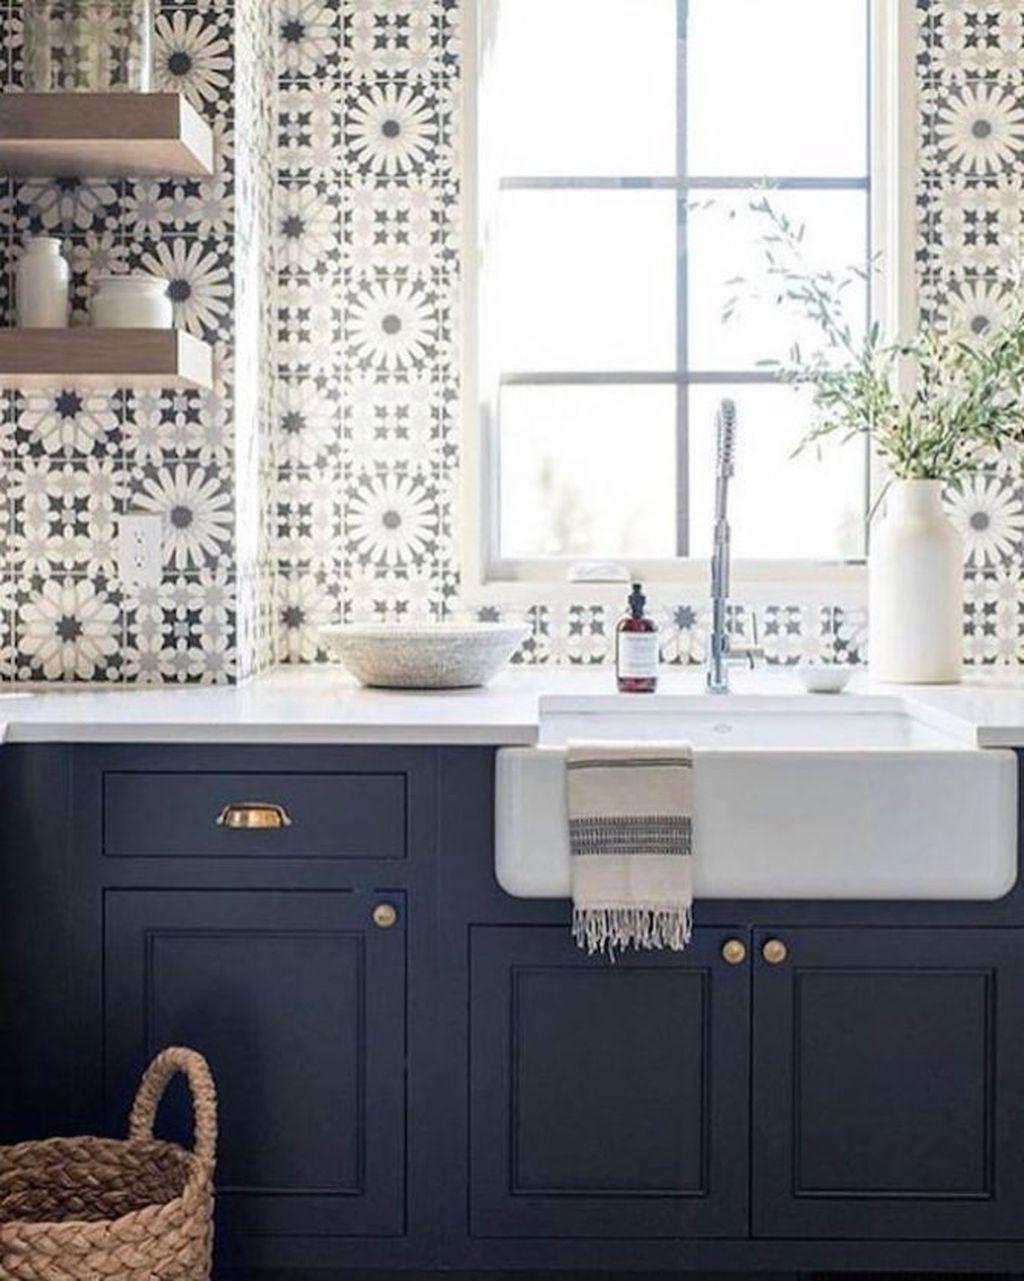 48 Unique Kitchen Backsplash Design Ideas Diy Kitchen Remodel